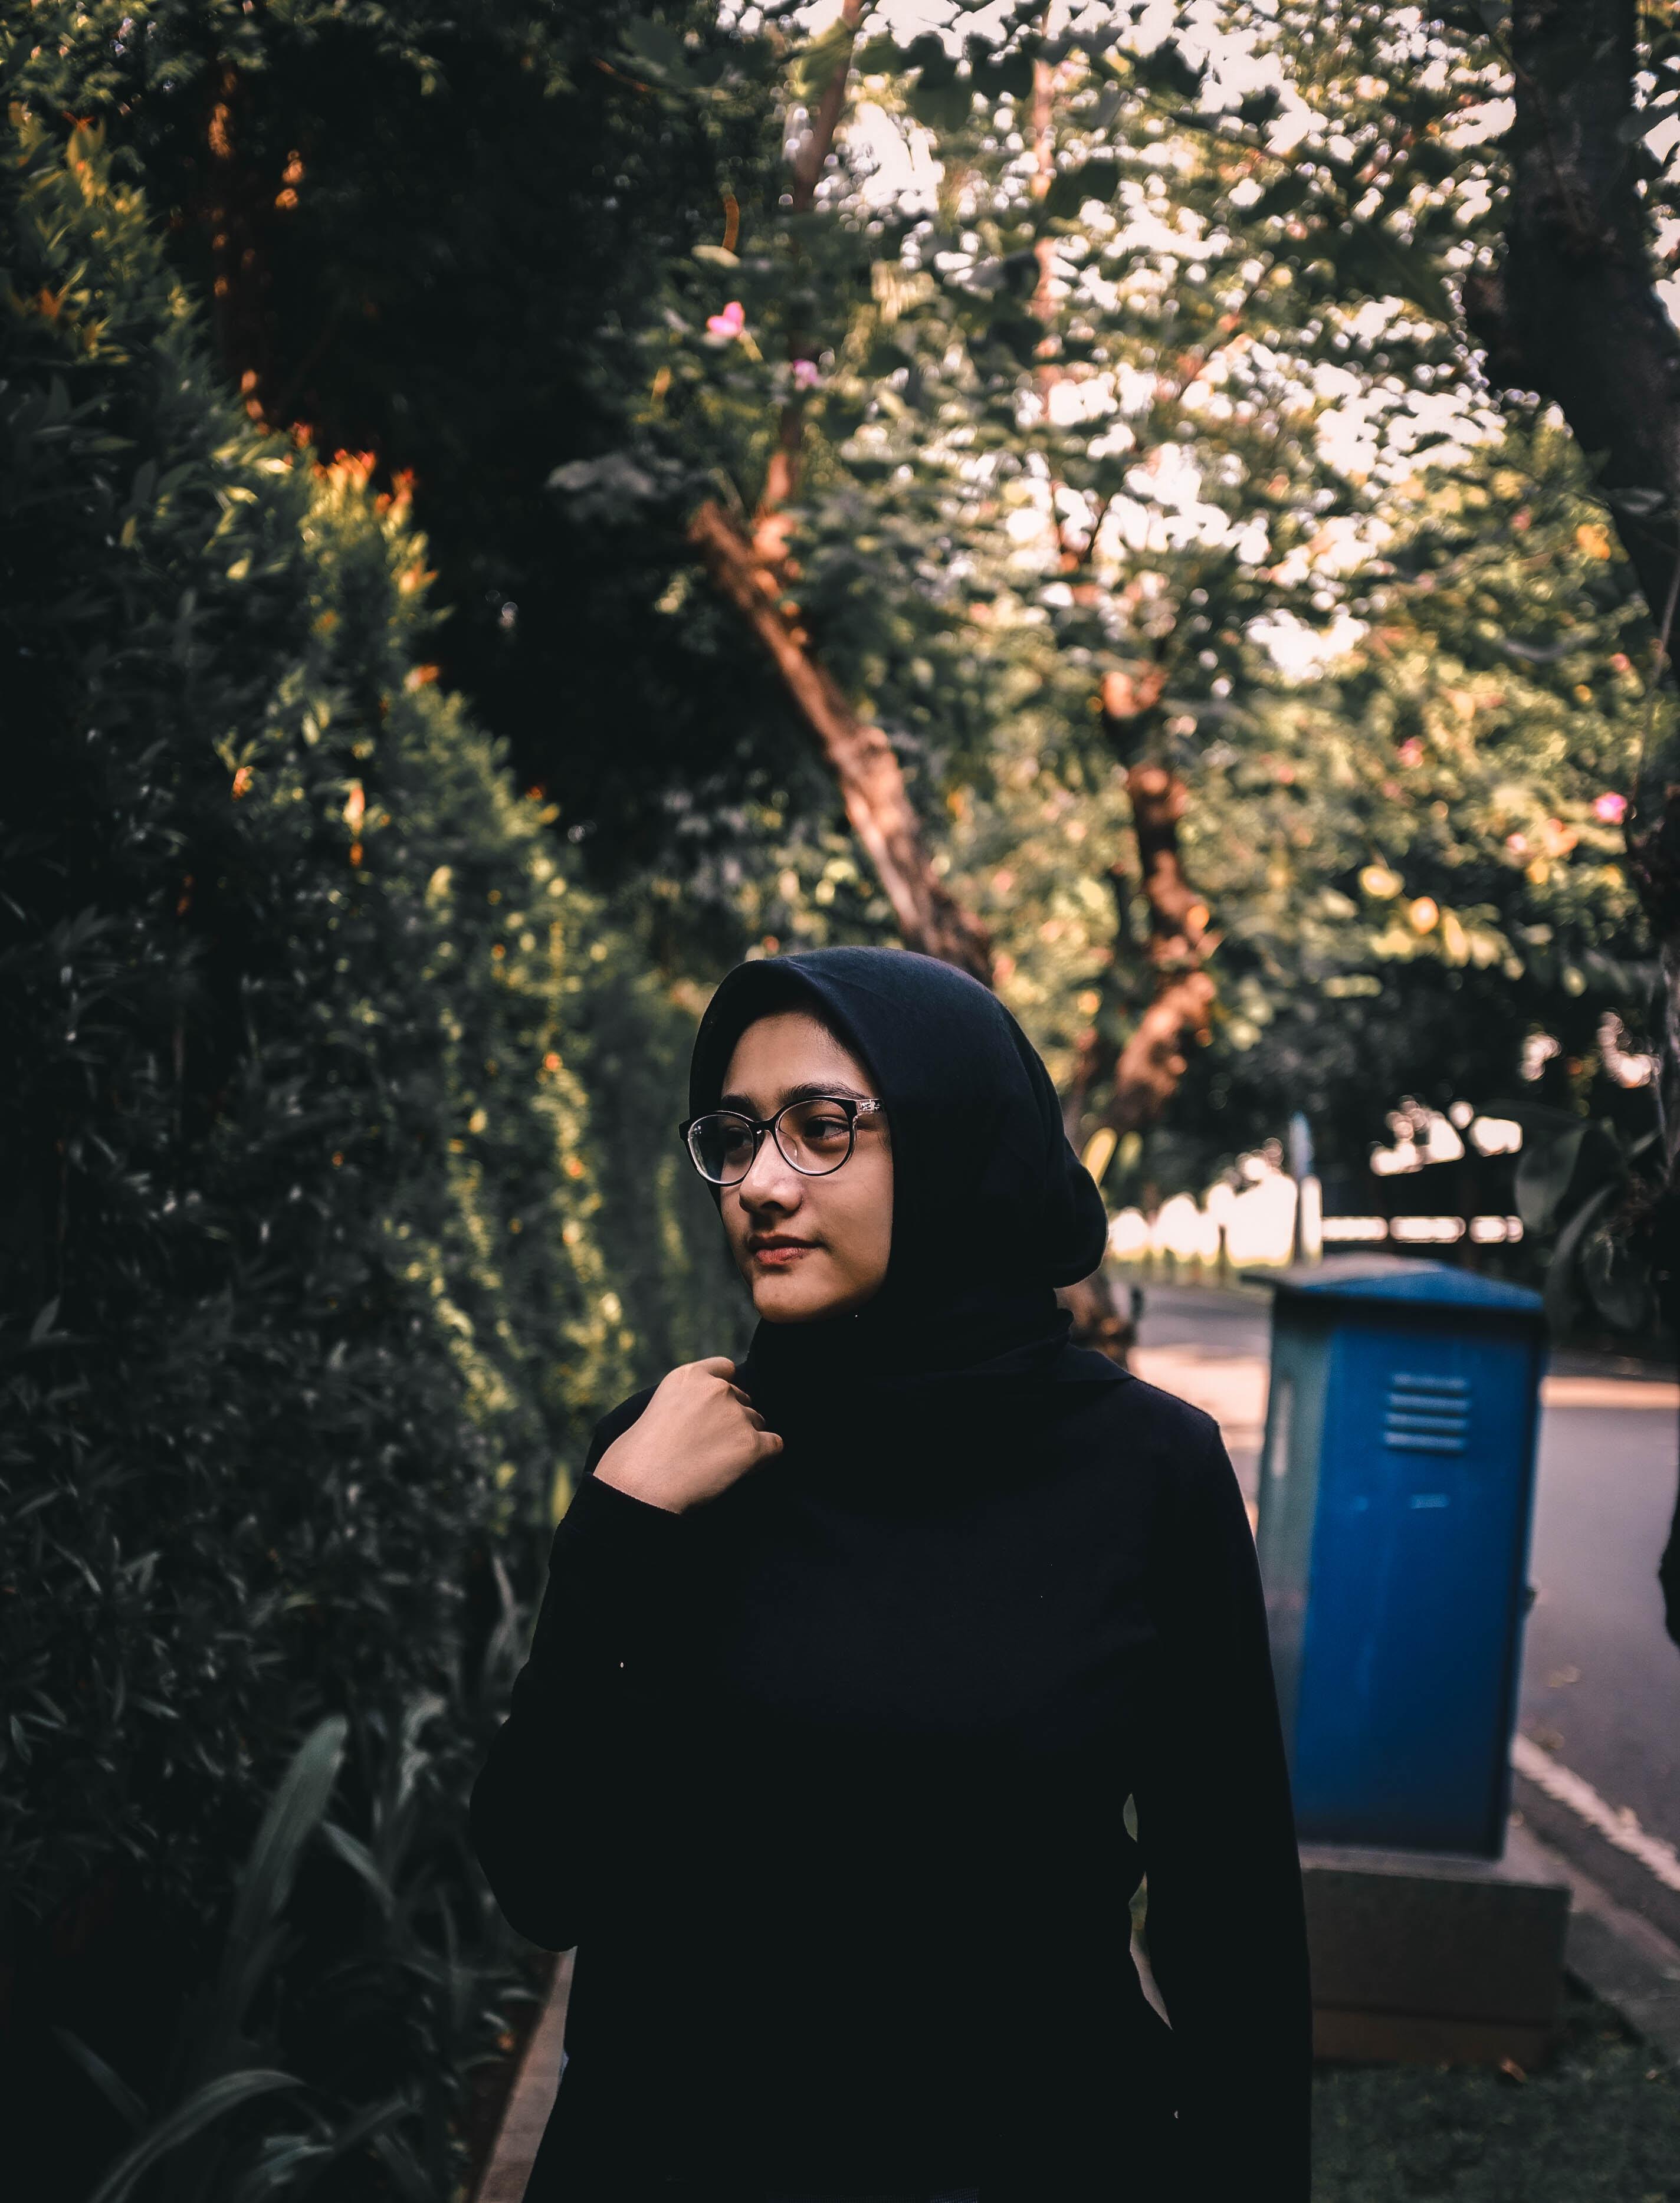 woman in black abaya dress